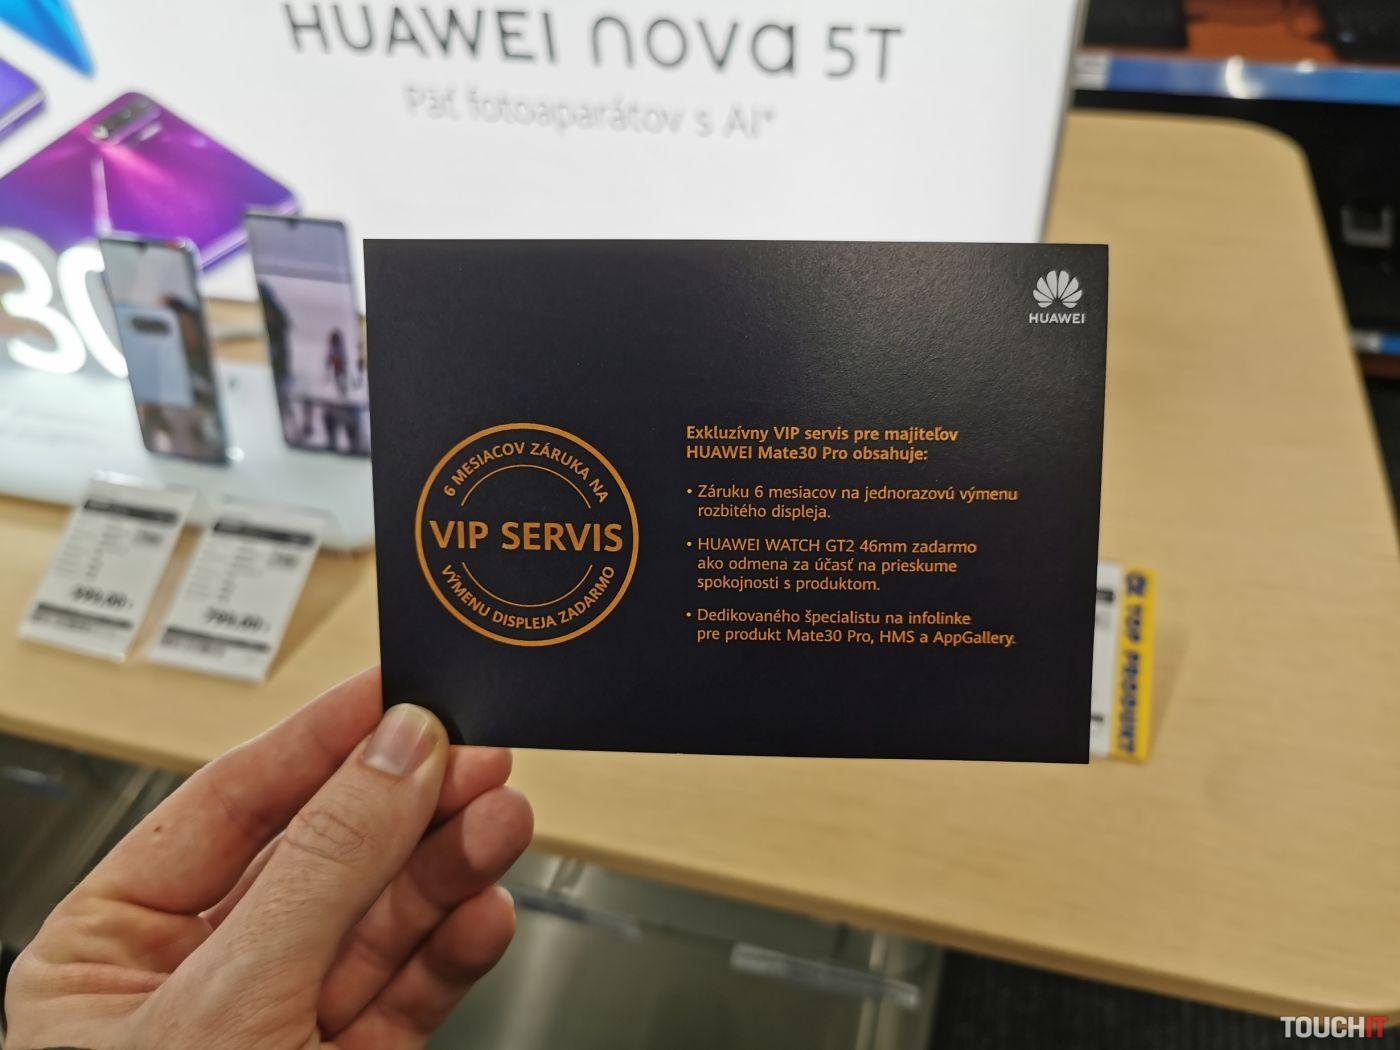 Huawei VIP servis